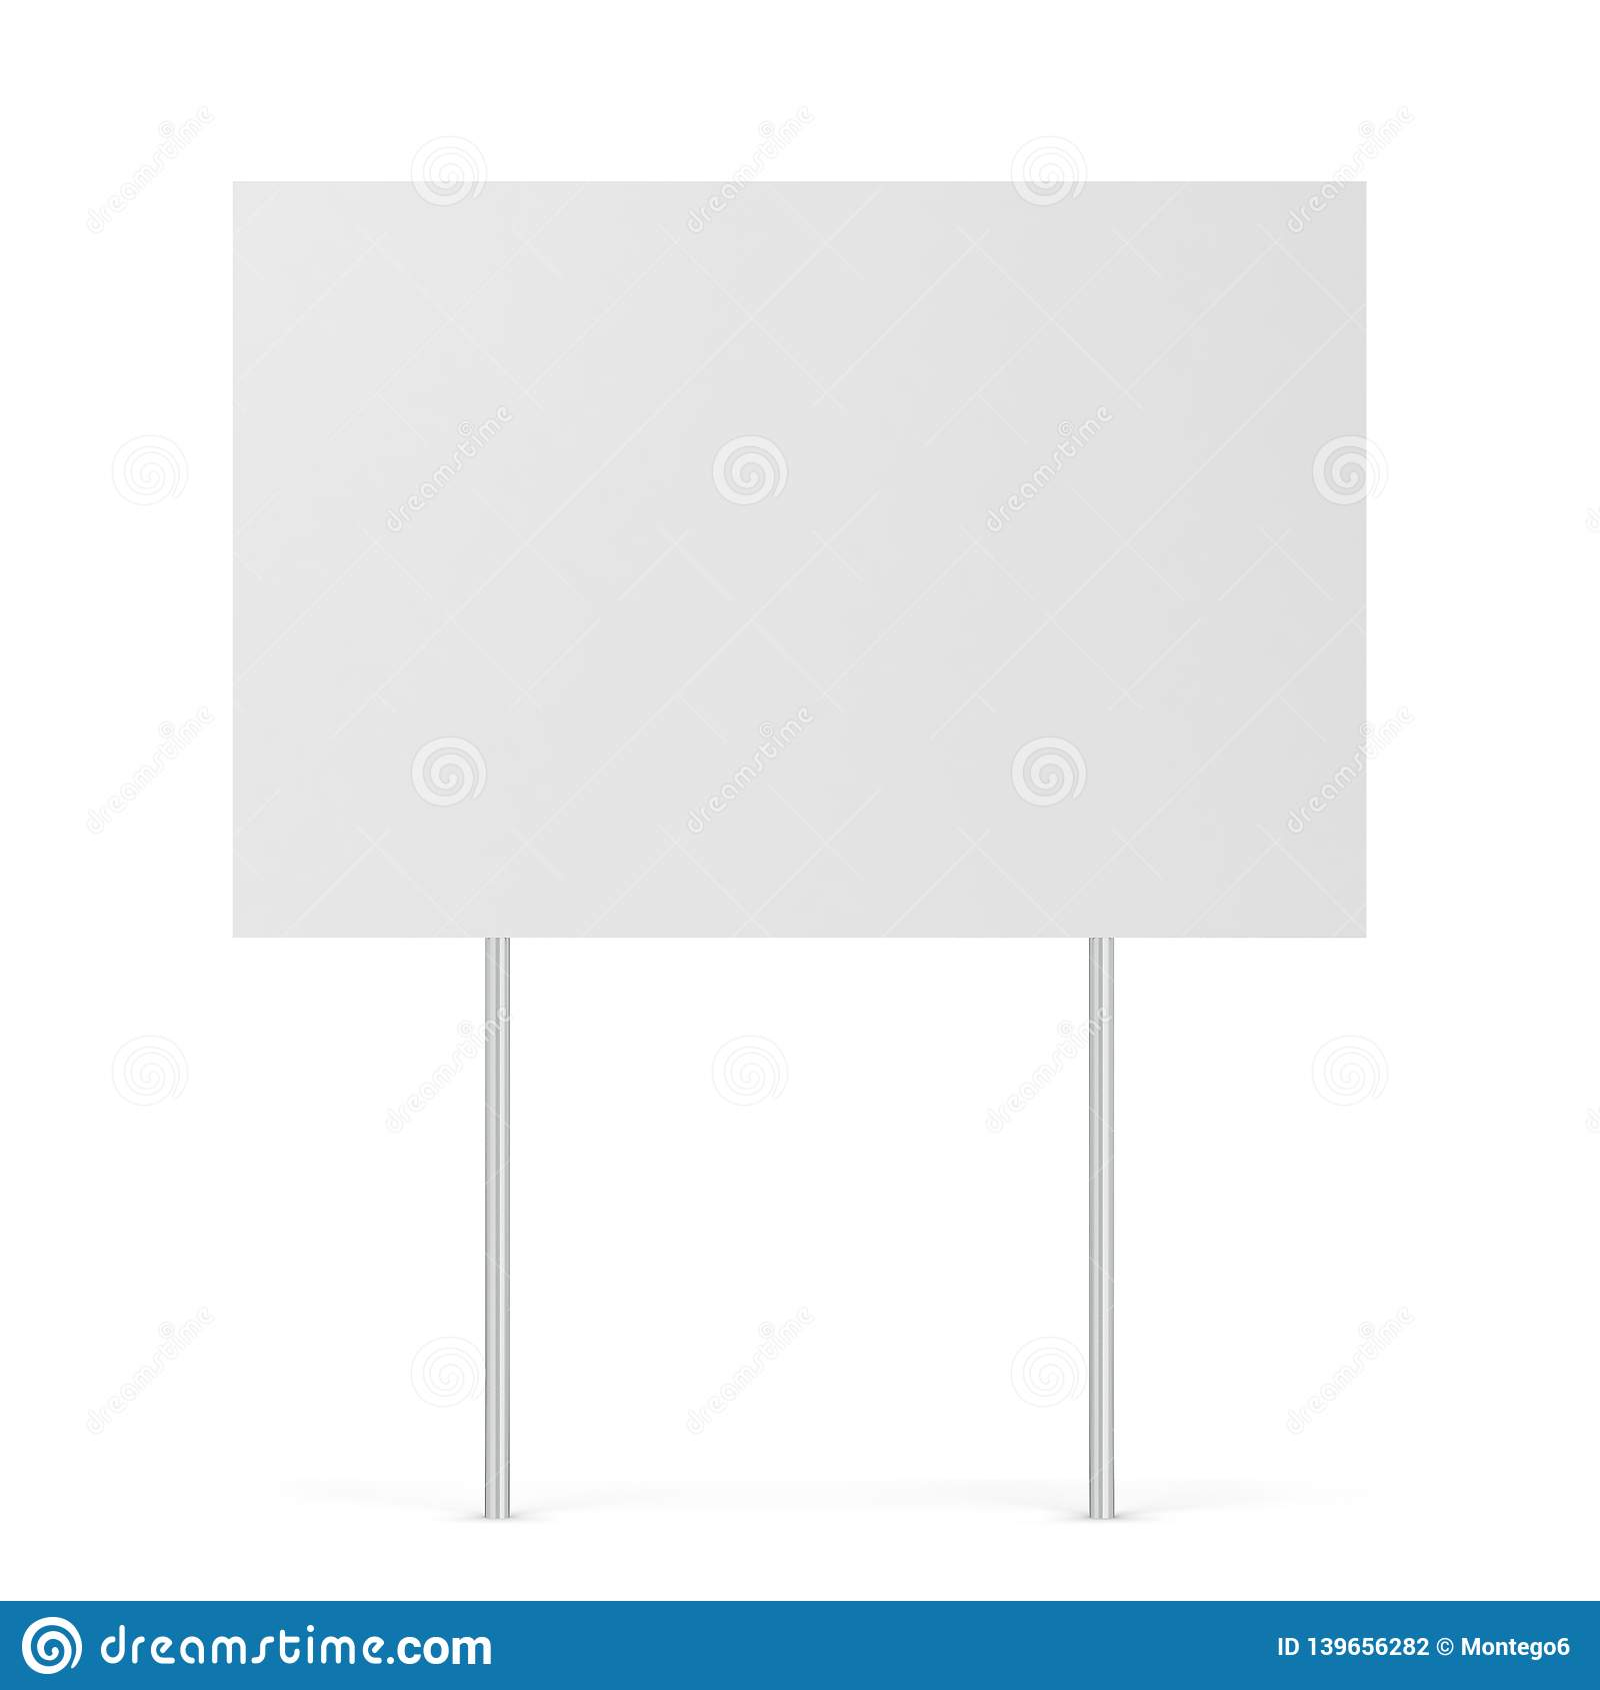 Blank yard sign